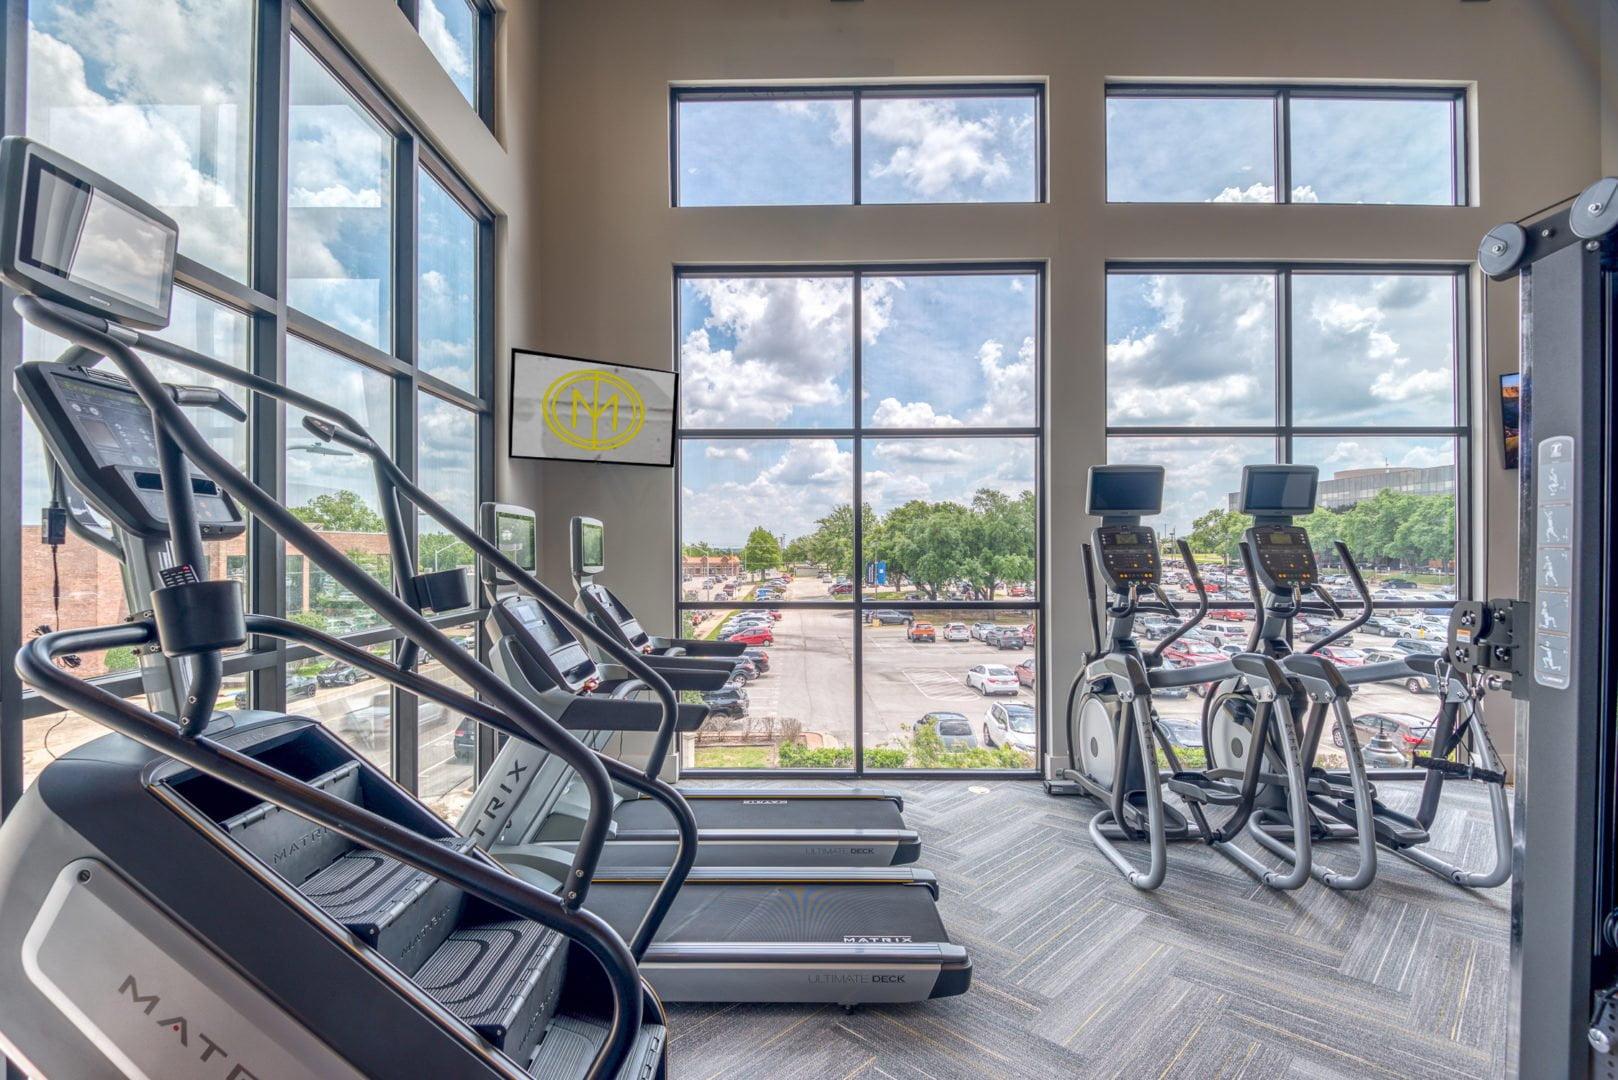 apartment fitness studio